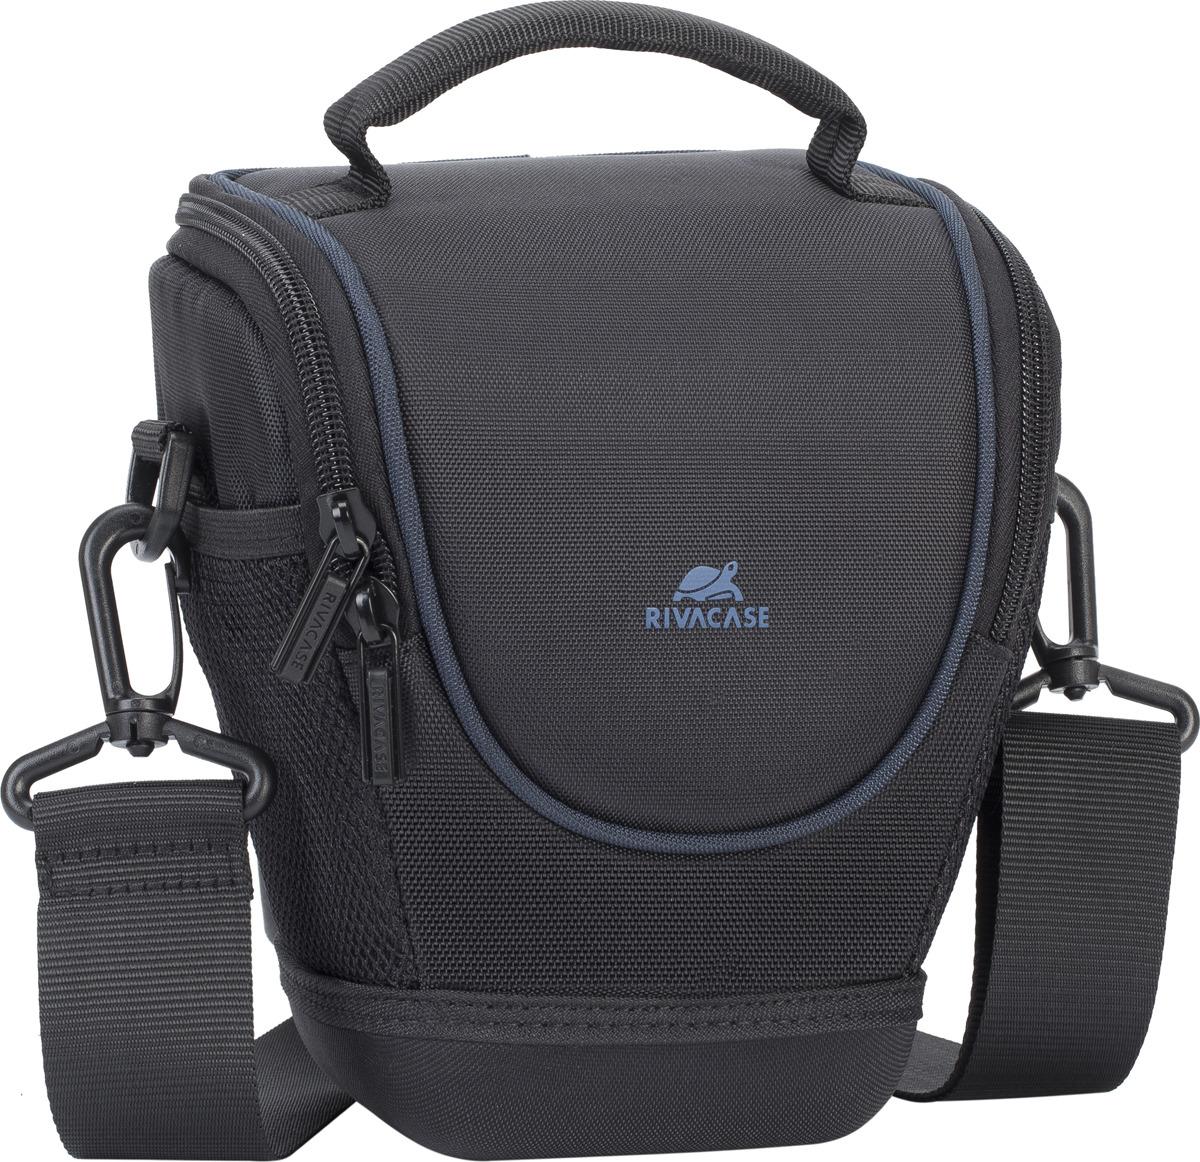 Сумка для фотоаппарата RivaCase 7201 SLR Black